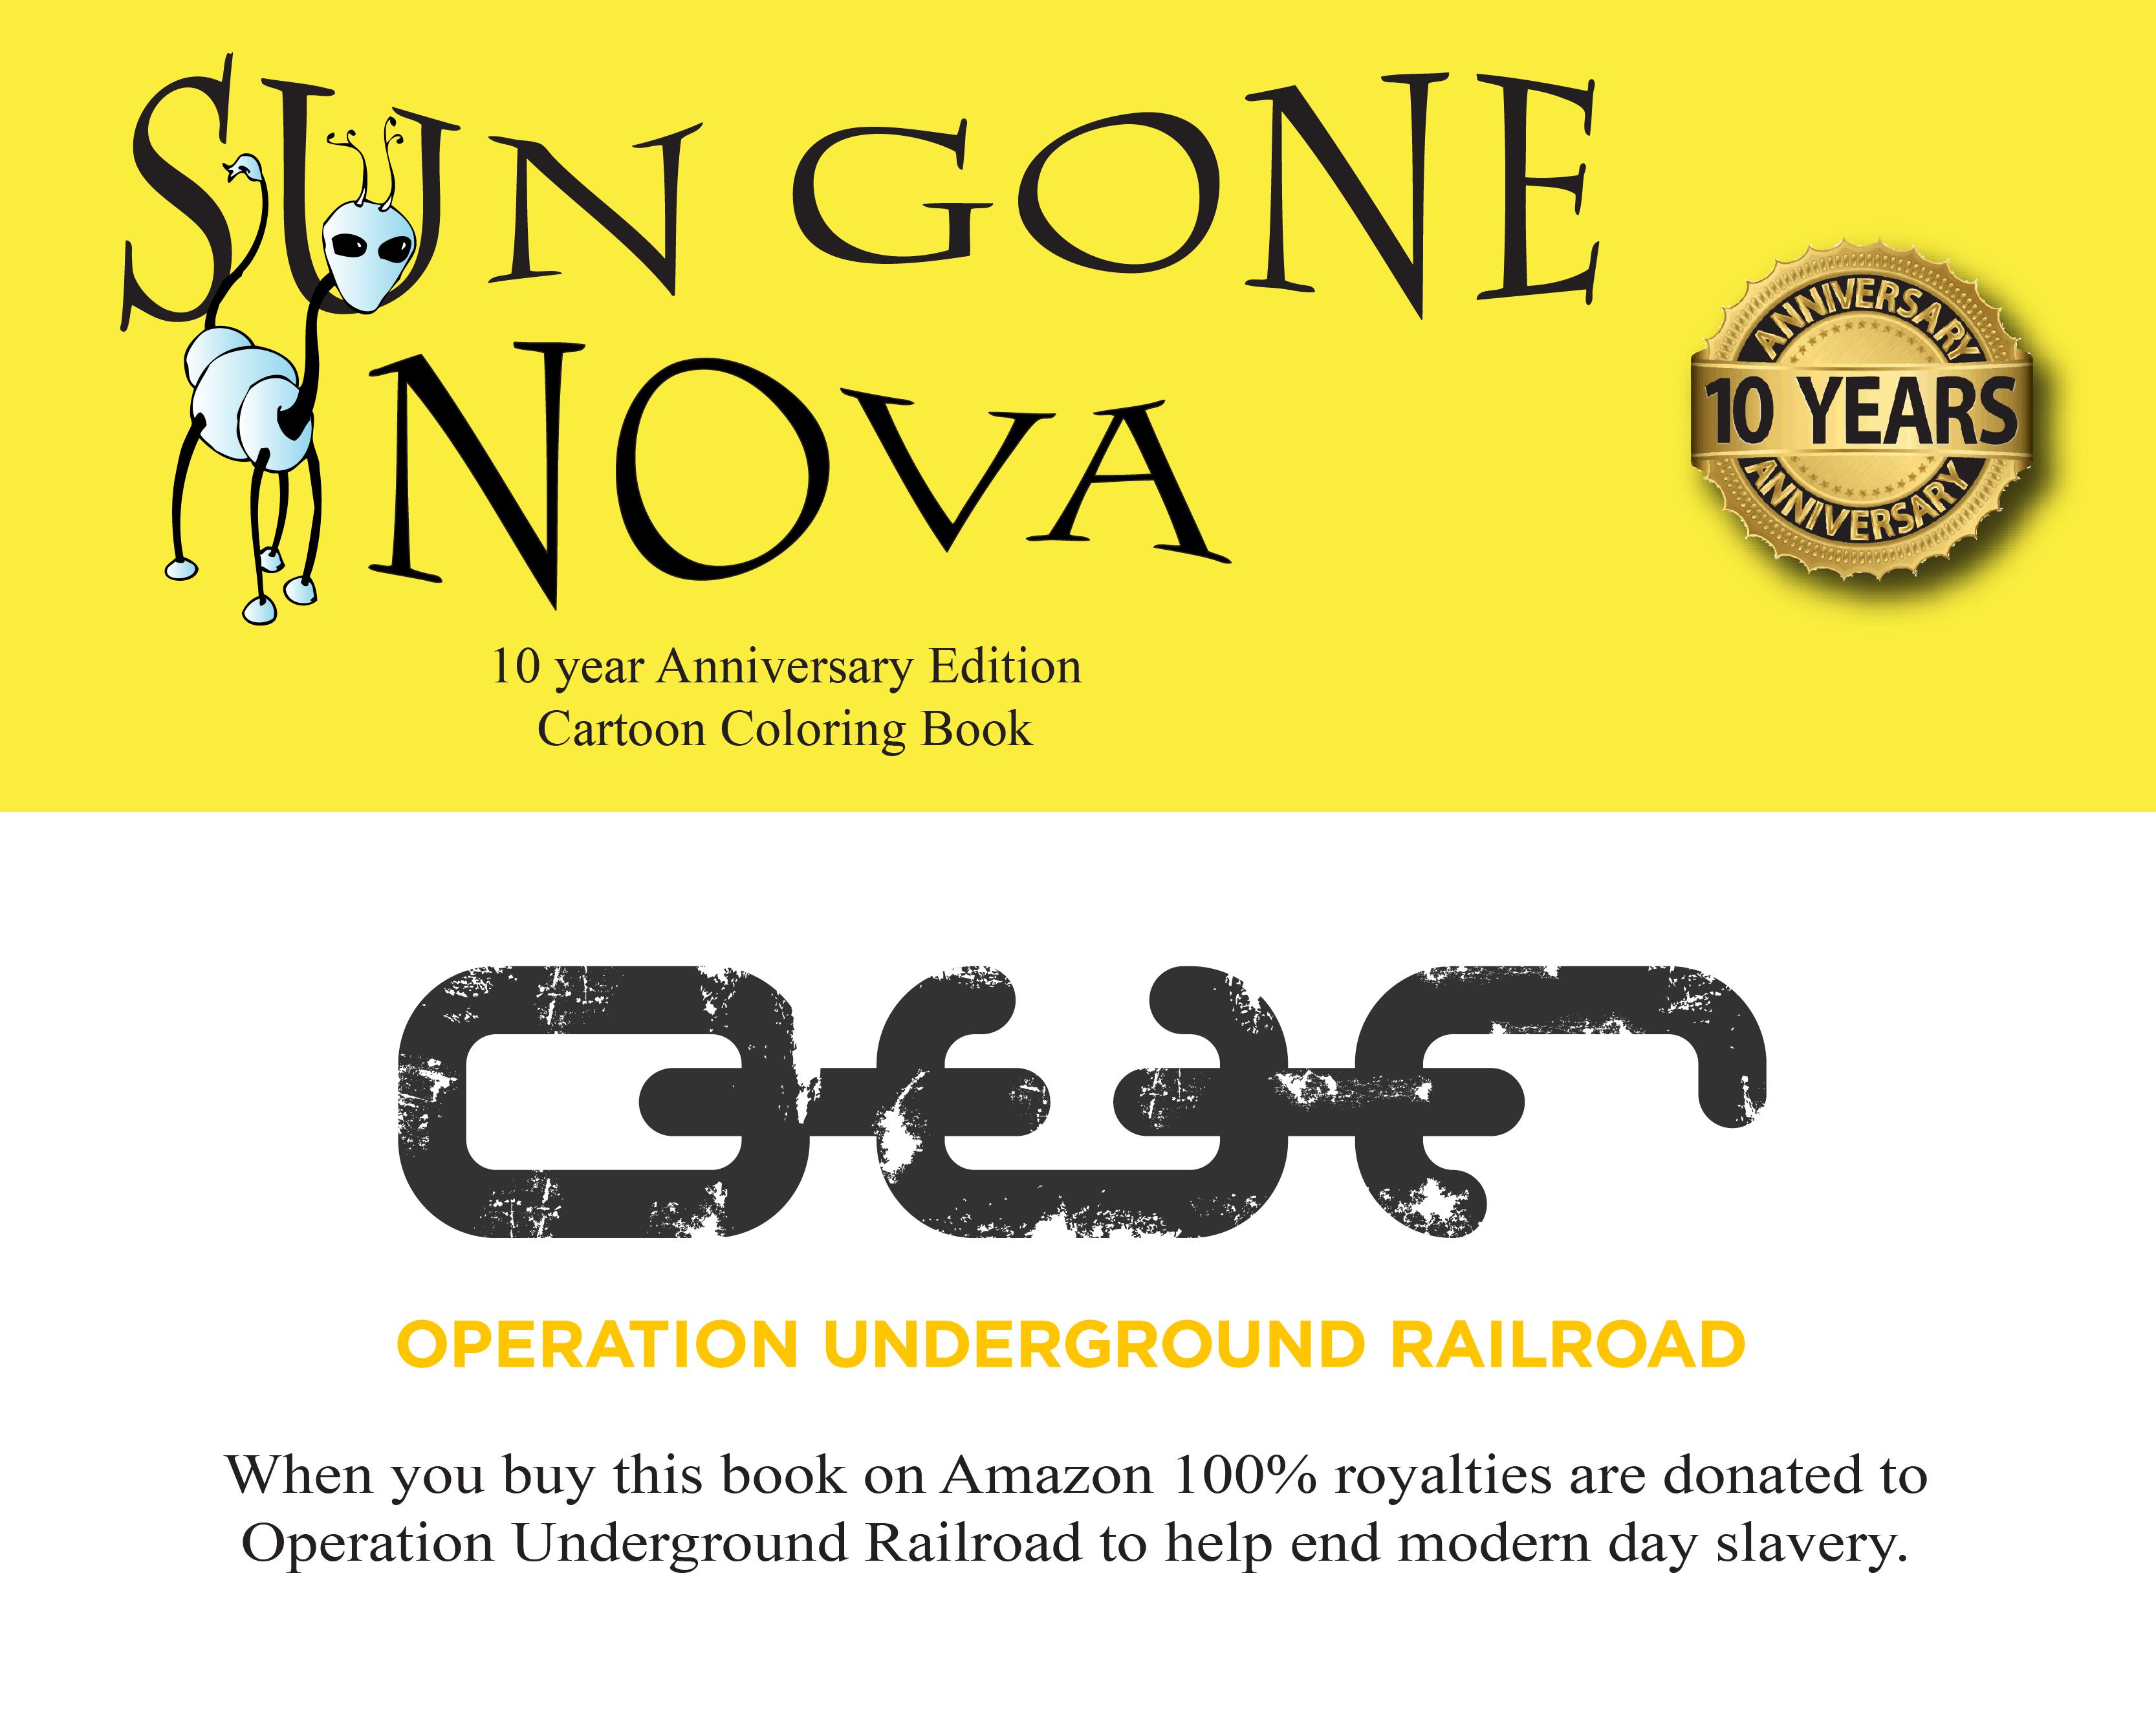 Sun Gone Nova Coloring Book Fundraiser